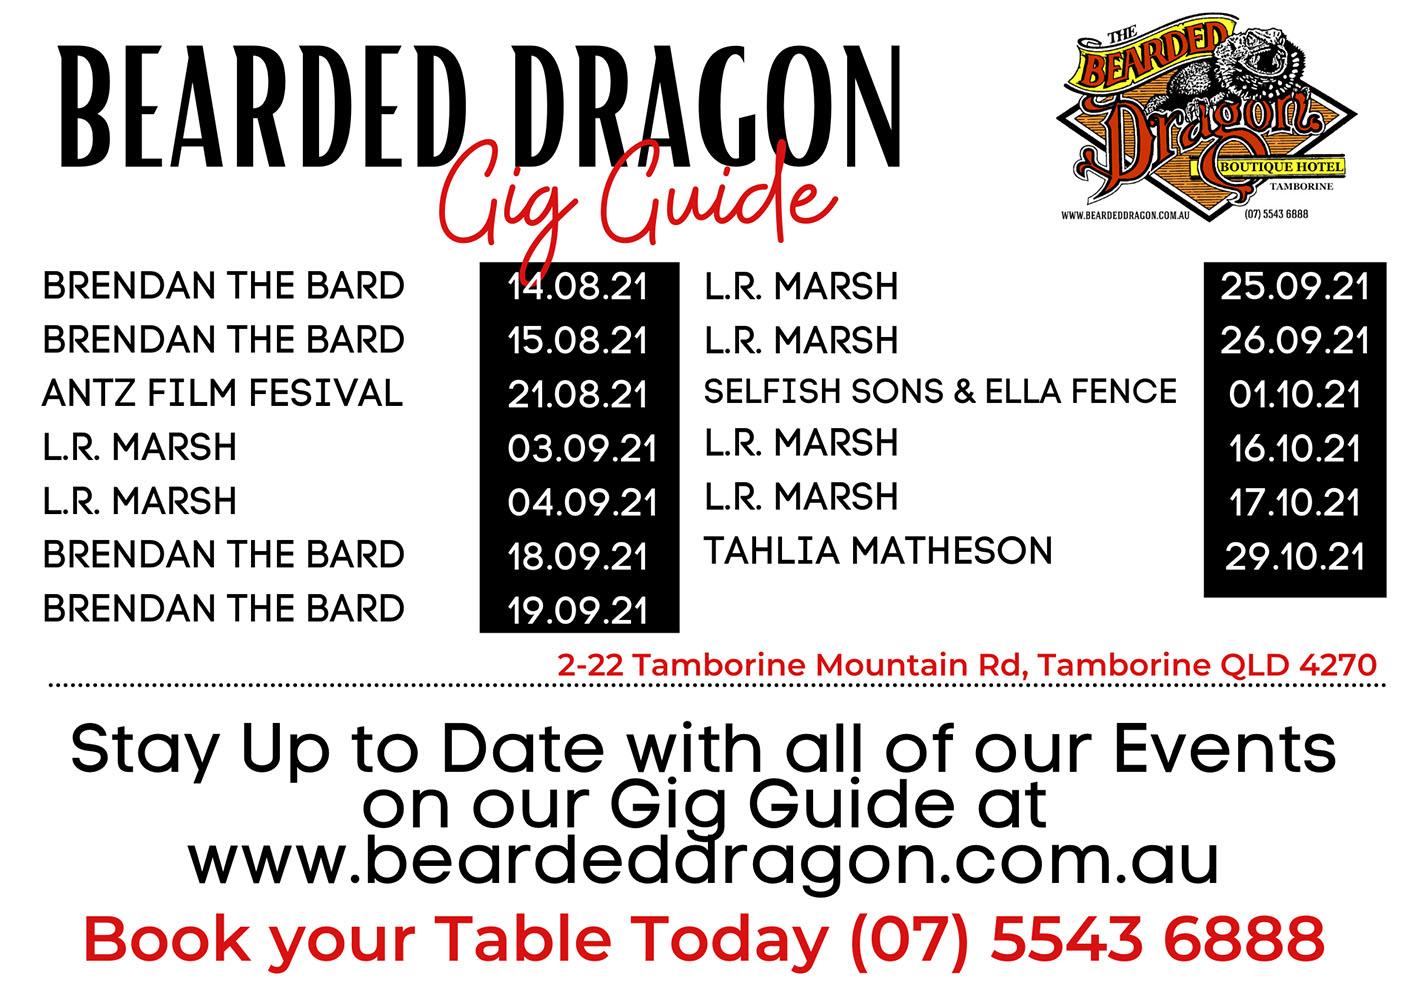 Bearded Dragon Gig Guide